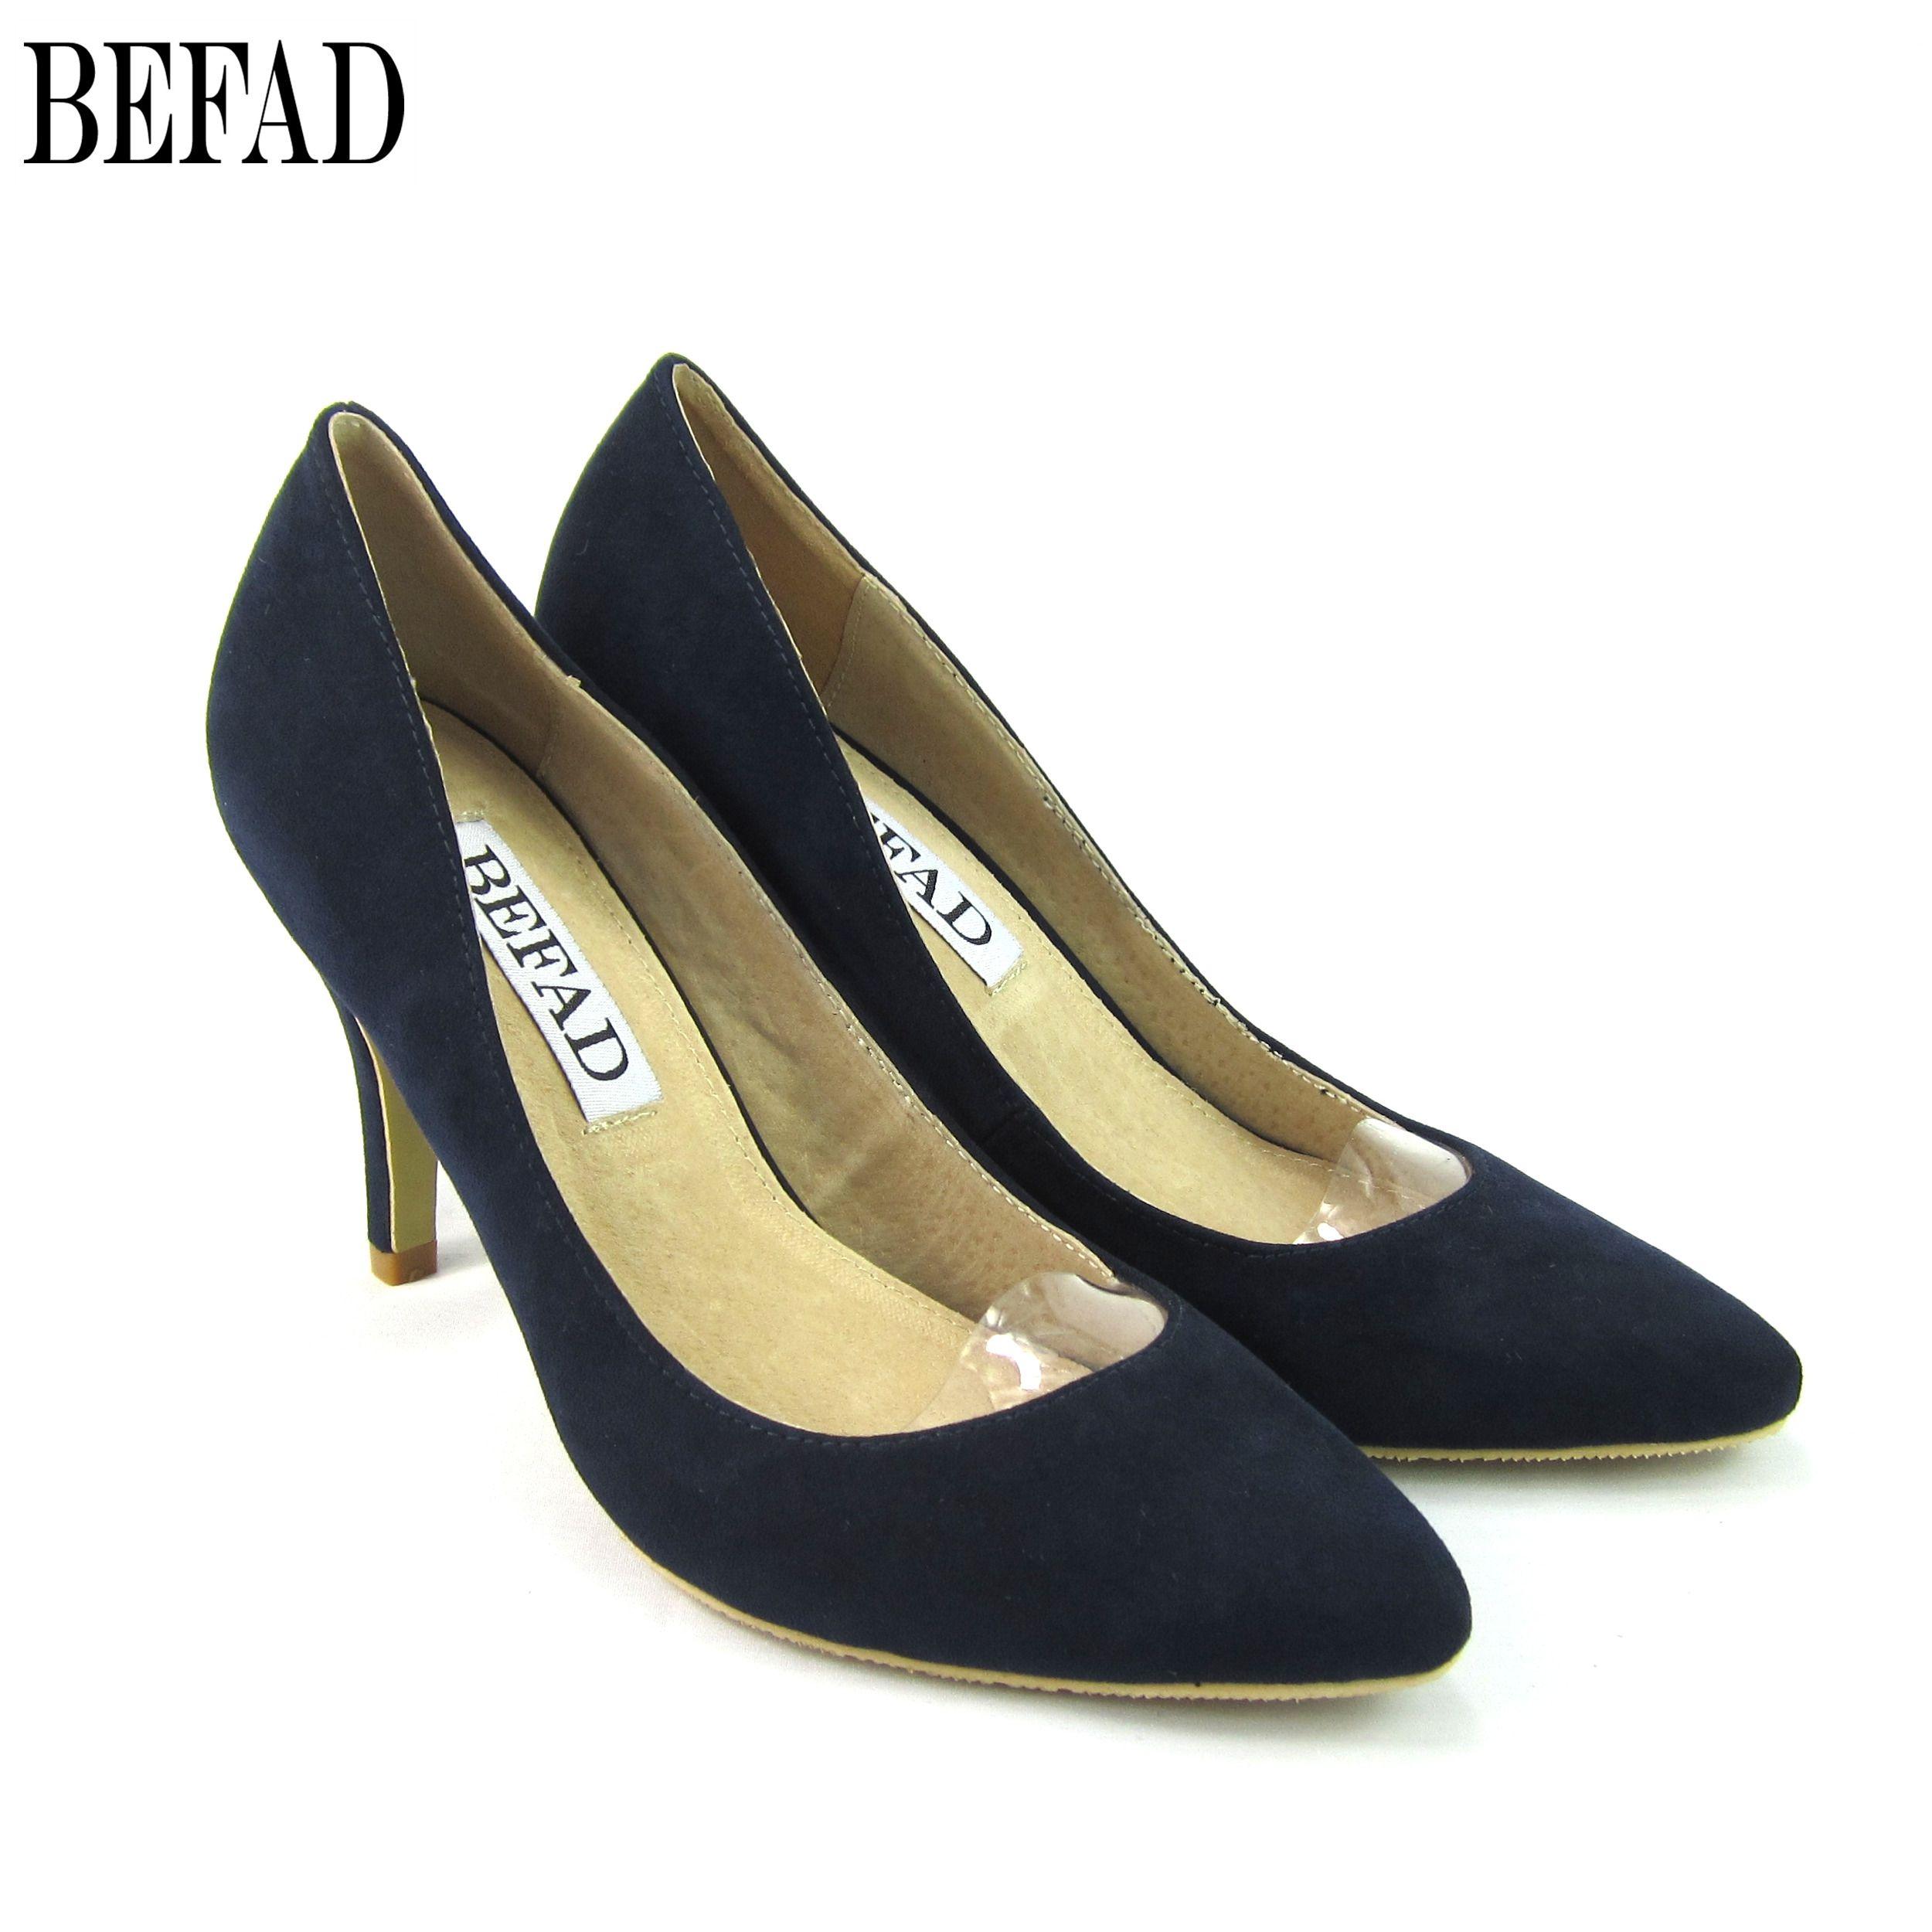 Reheeling Shoes High Heels